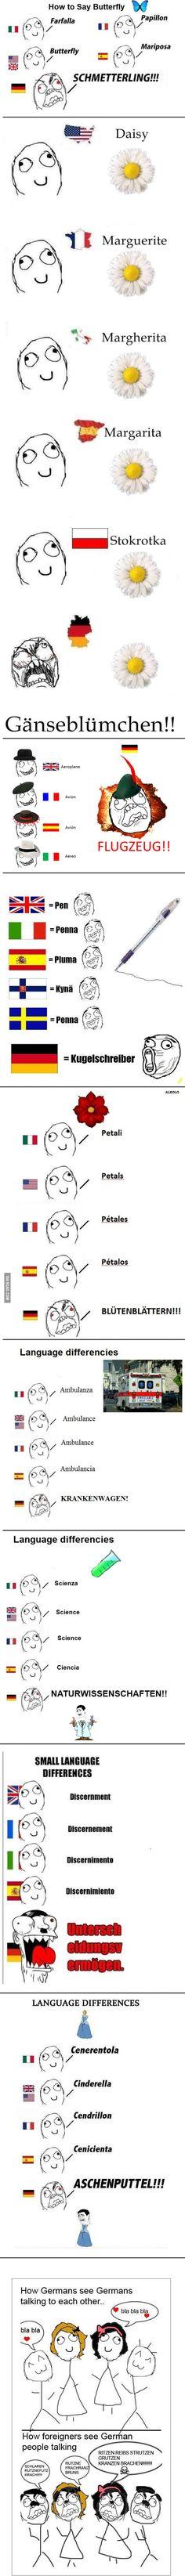 The German language... too funny!